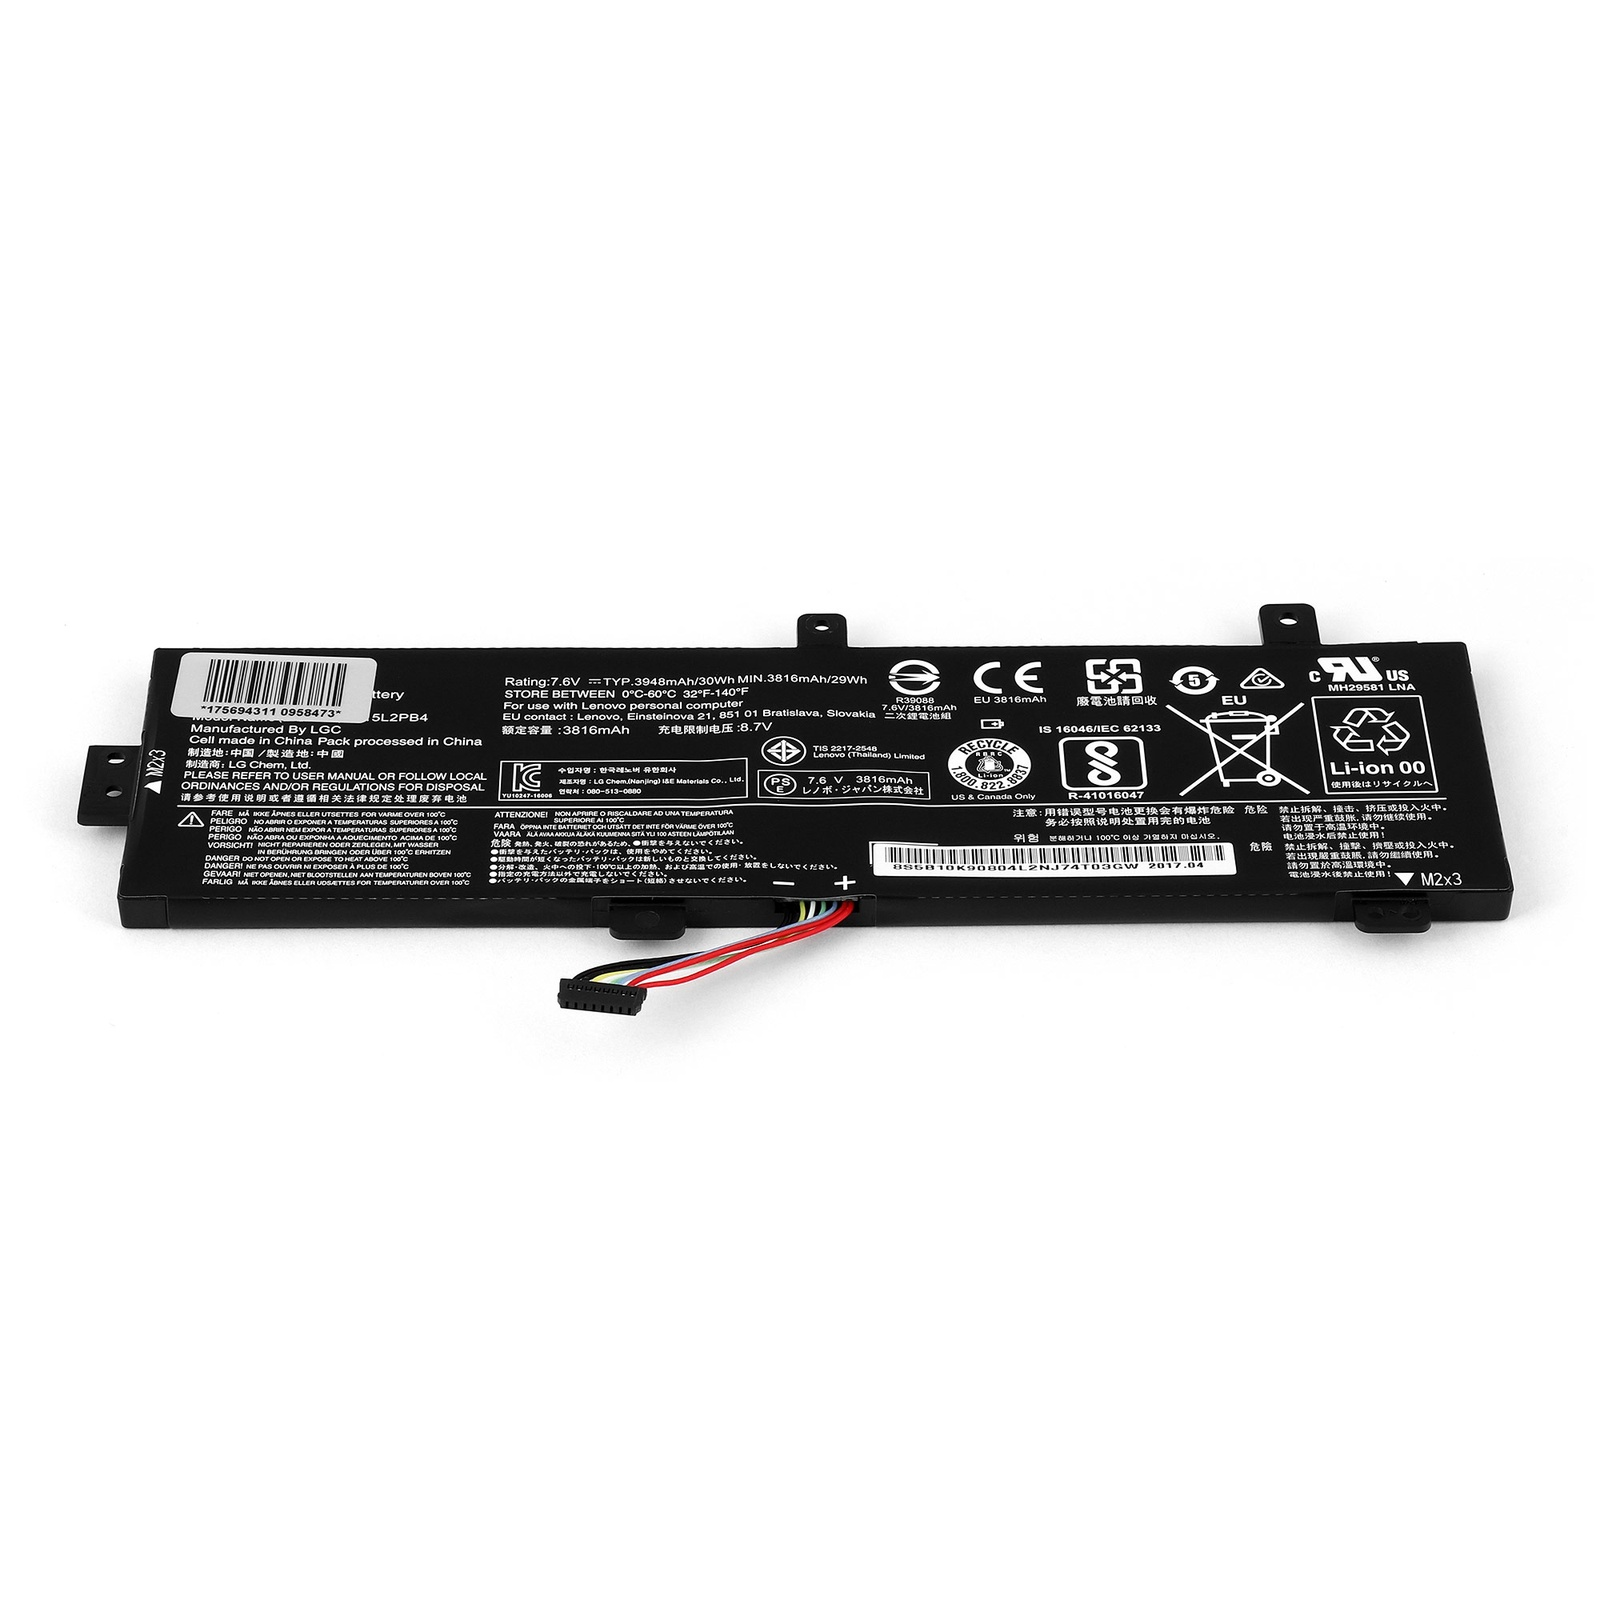 Аккумулятор для ноутбука OEM Lenovo IdeaPad 310-15ISK Series. 7.6V 3950mAh PN: L15C2PB3, L15C2PB7 аккумулятор oem 15